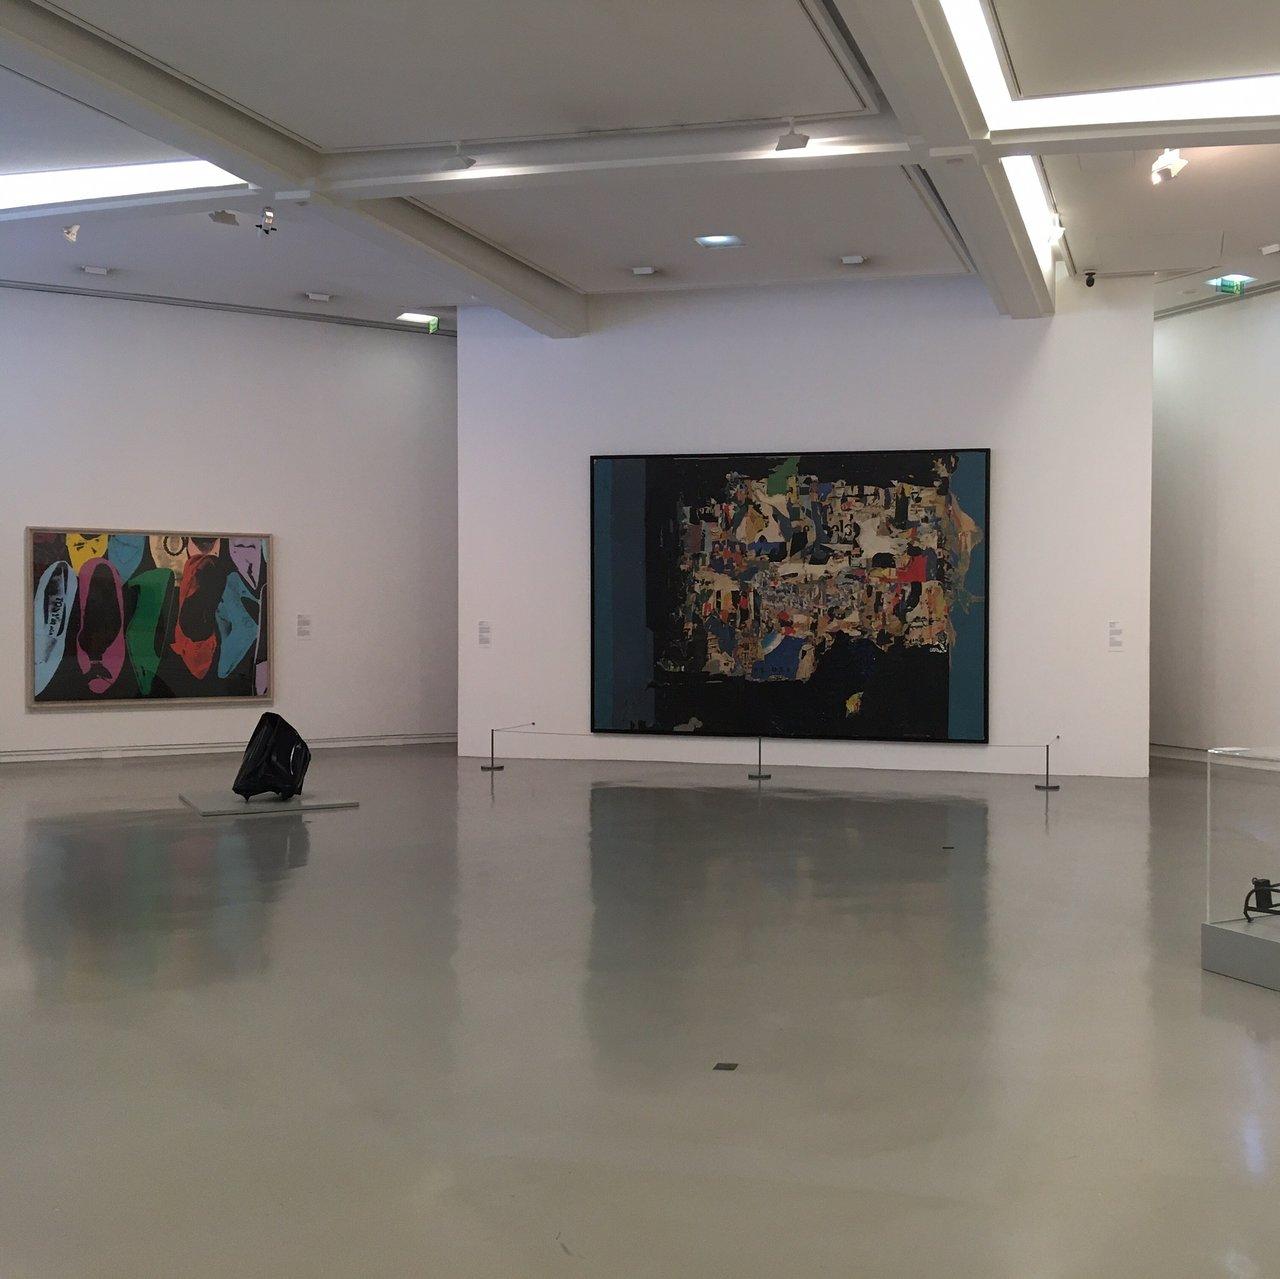 Musée D'art Moderne Et D'art Contemporain - Nice - Musée D ... avec Salon De Jardin Casino